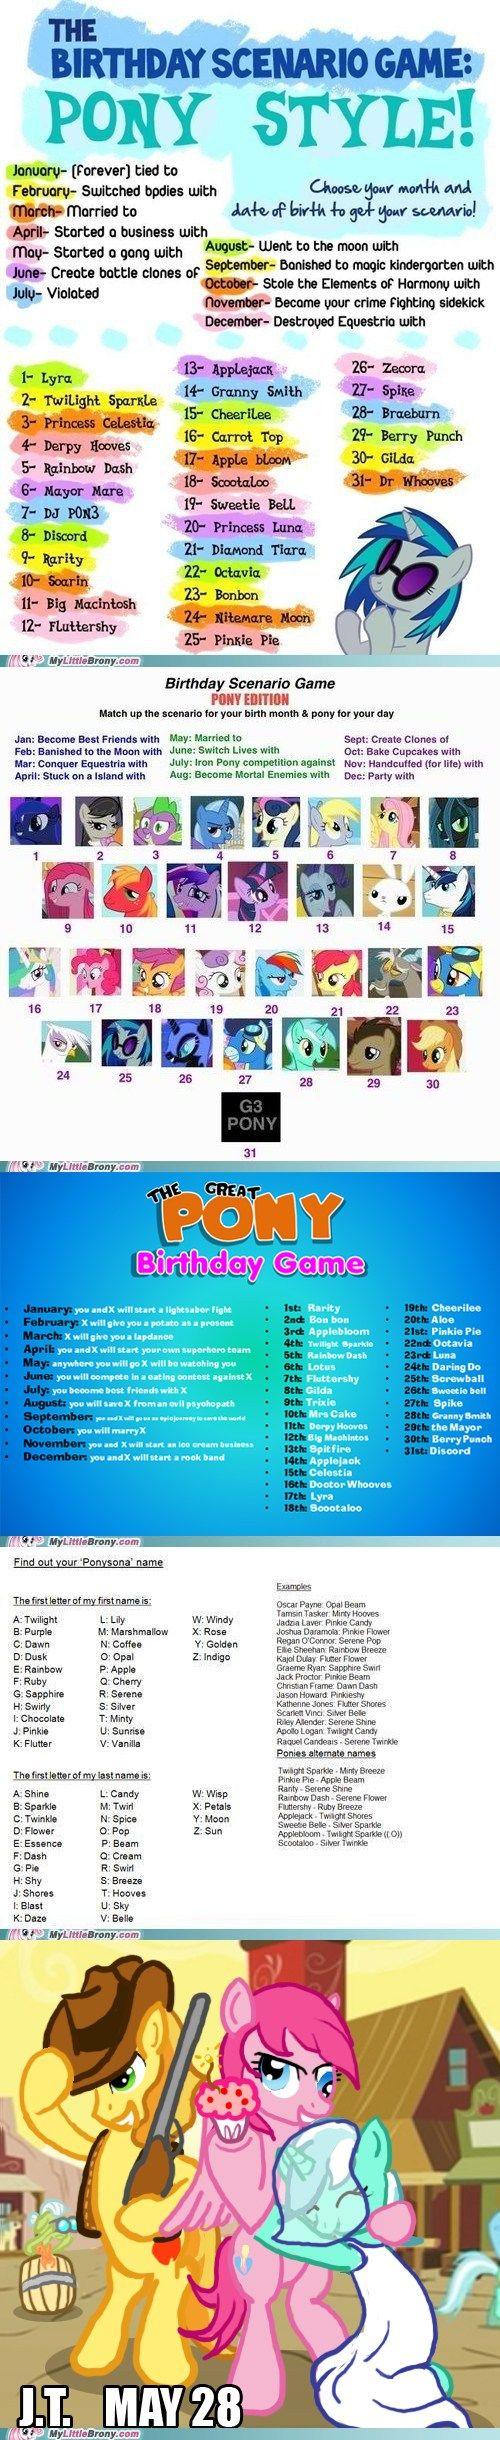 58 best Mlp images on Pinterest   Birthday scenario game, Funny ...